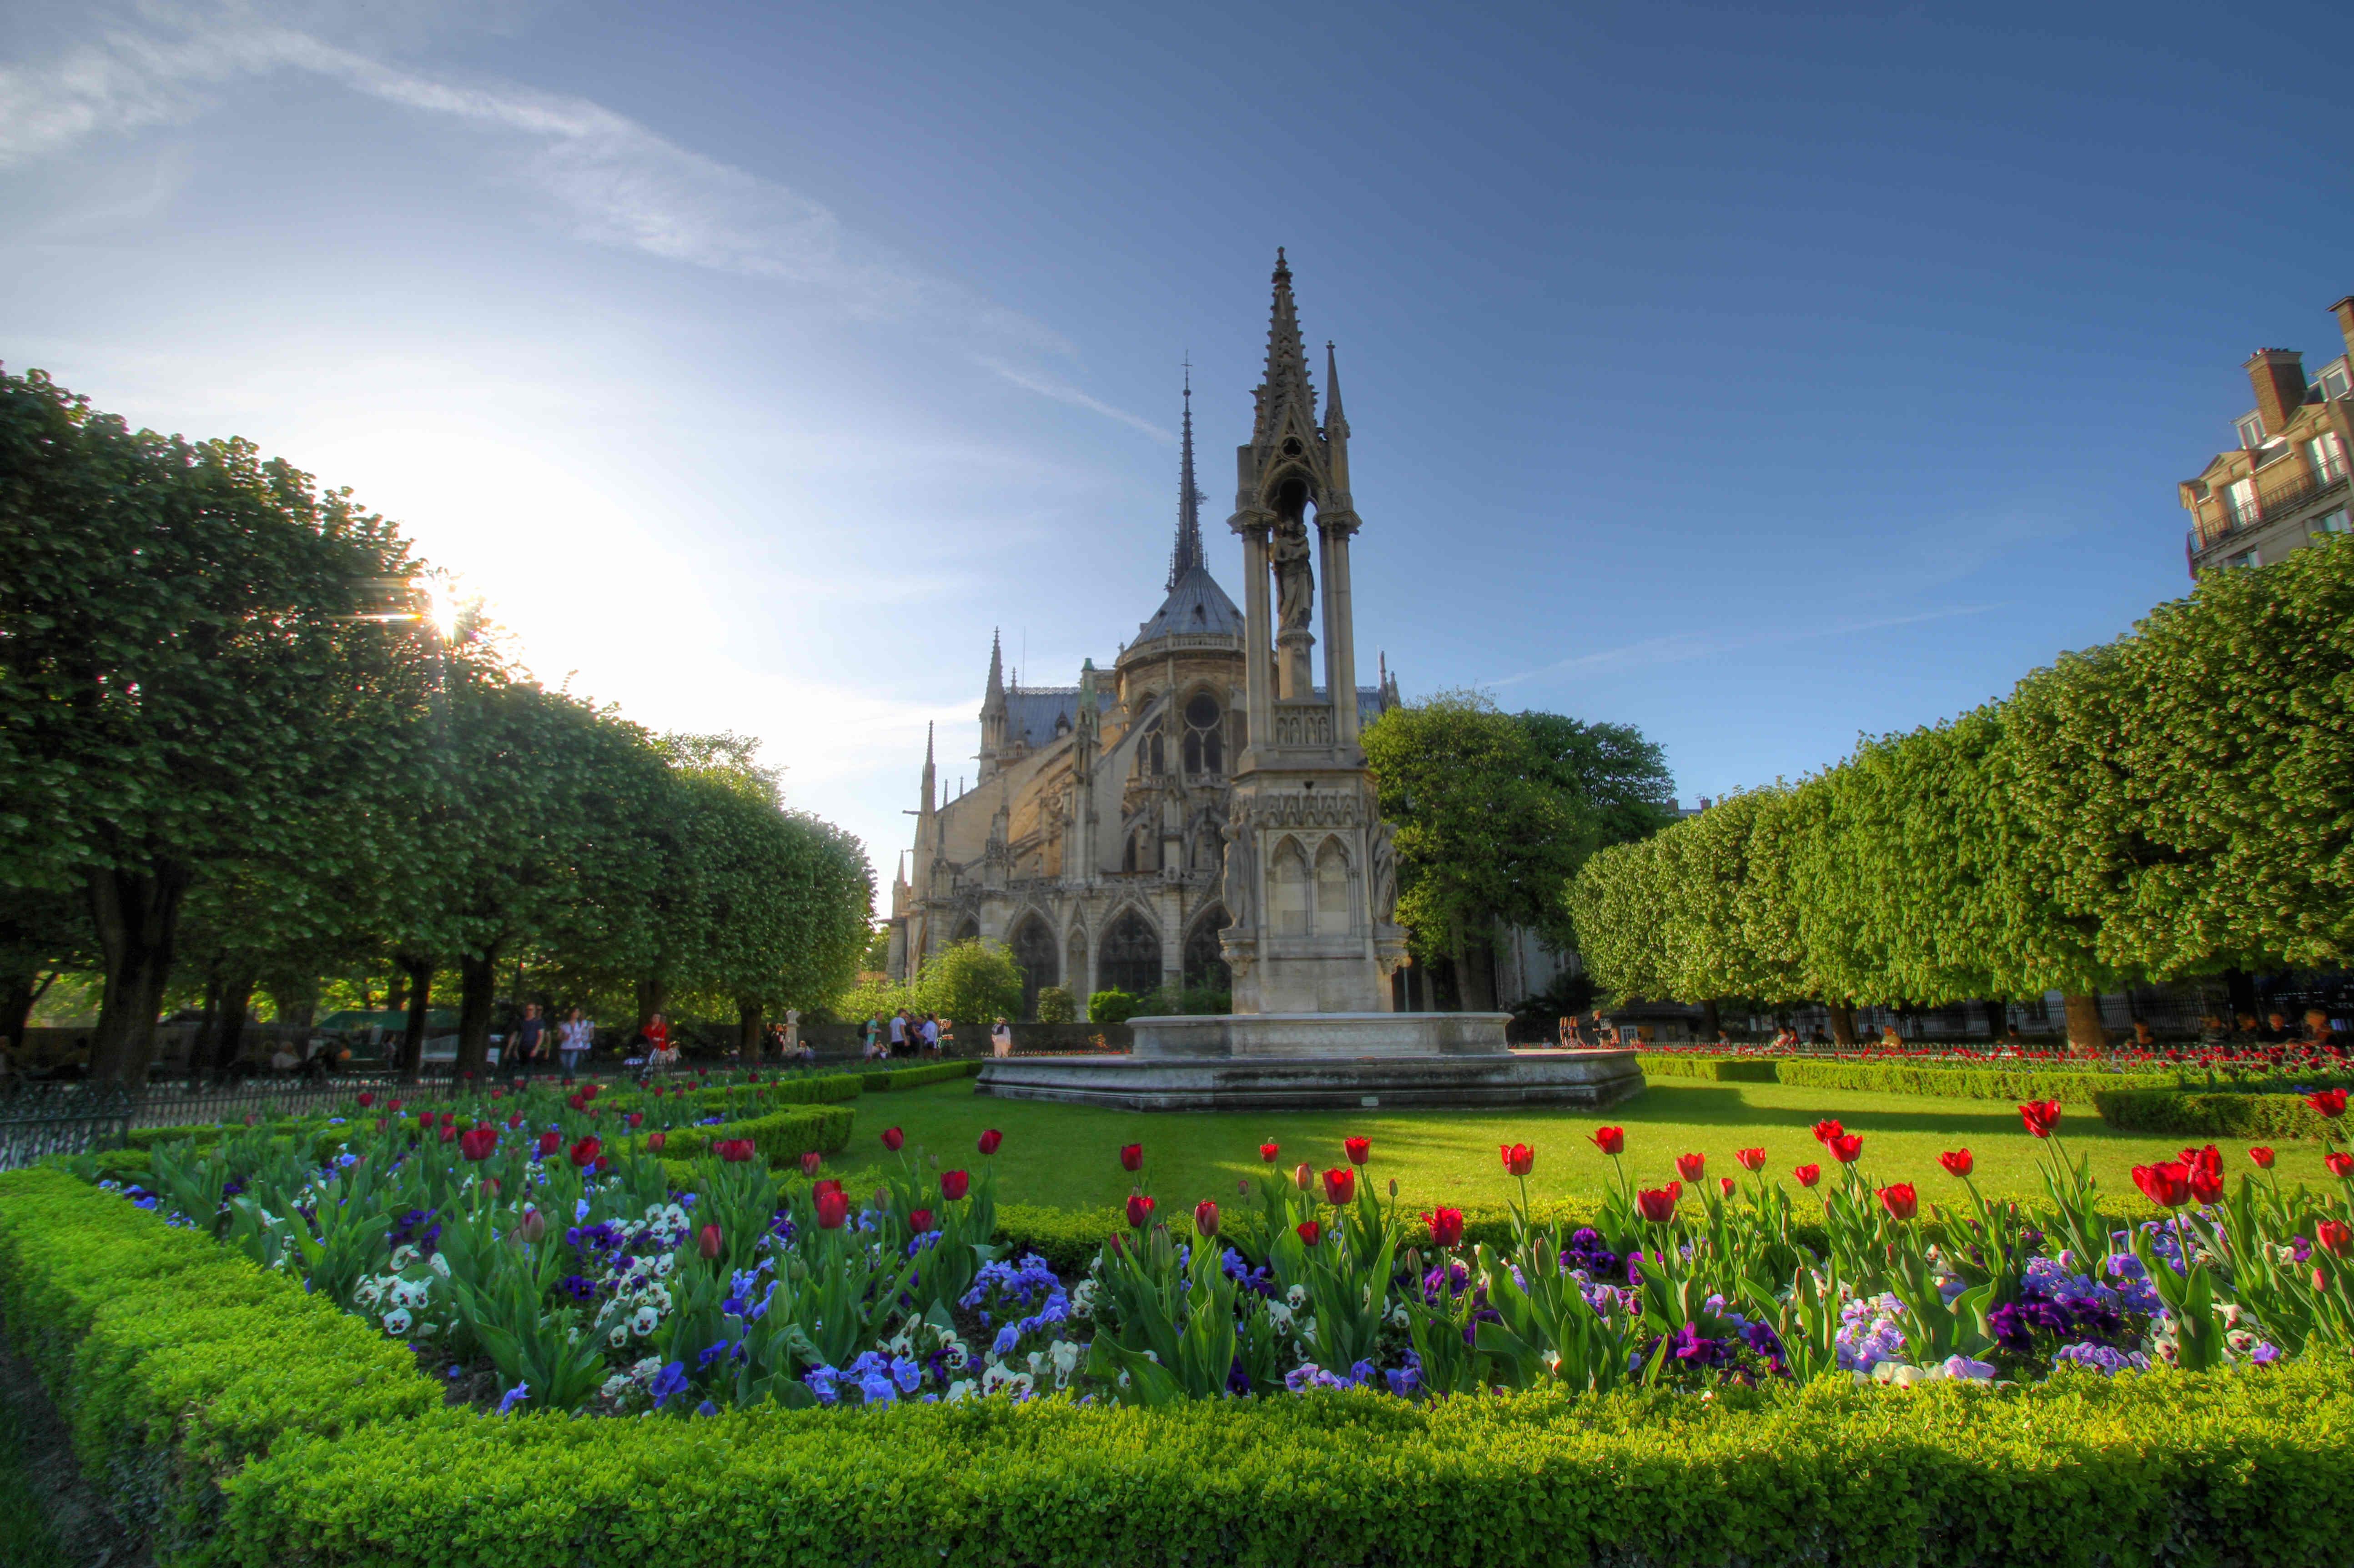 La_cathedrale_Notre_Dame_vue_des_jardins_3.jpg